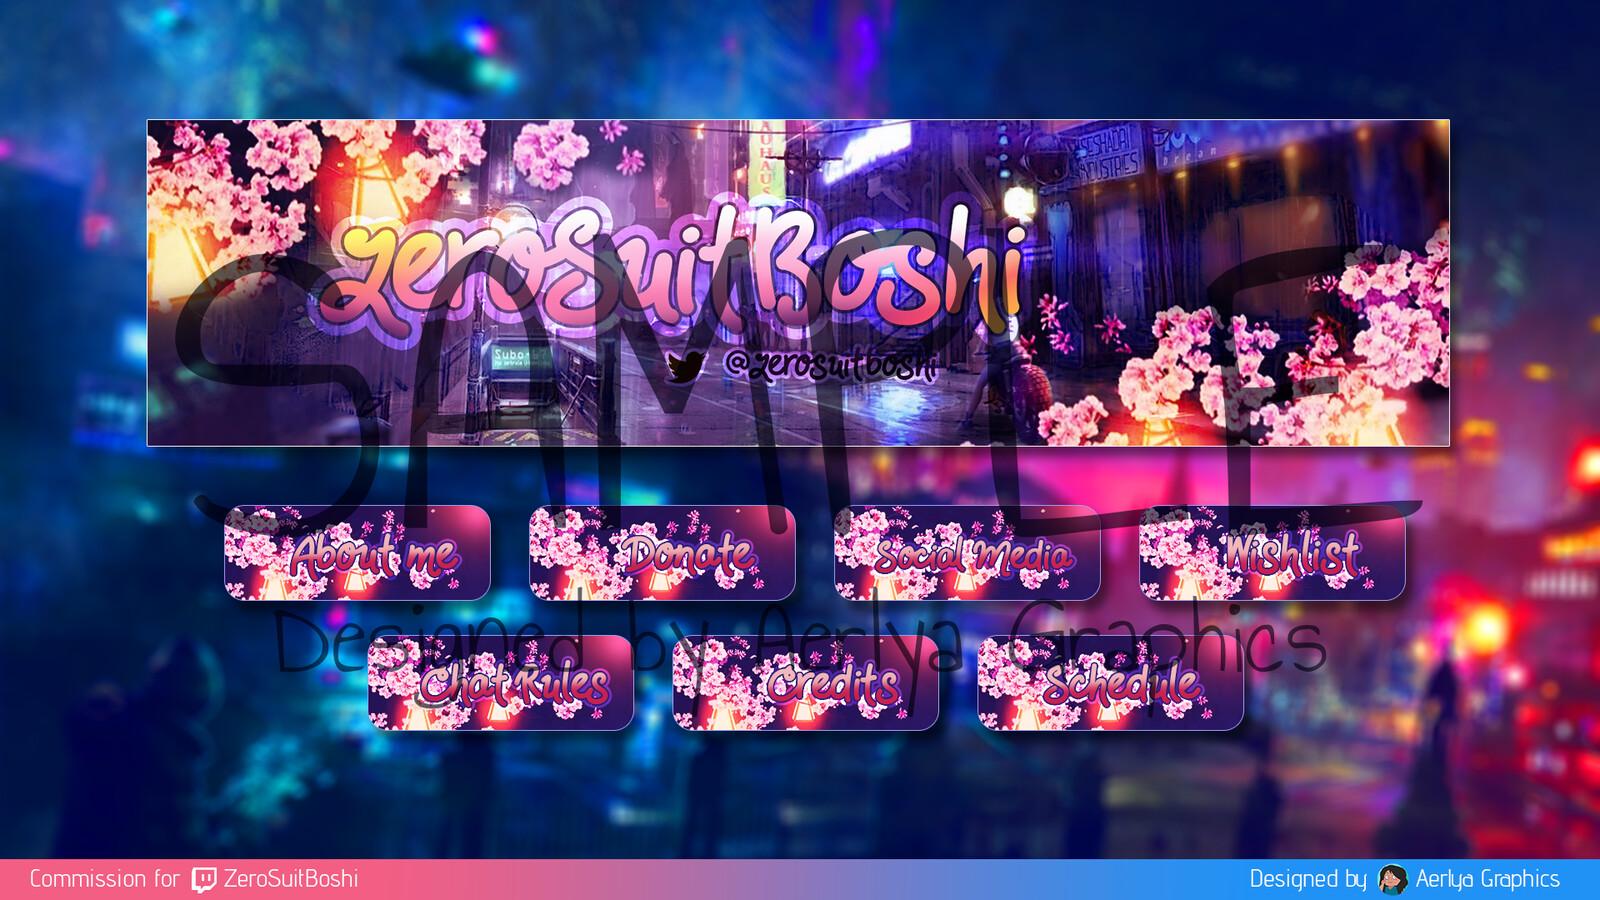 Custom header and panels for ZeroSuitBoshi on Twitch.